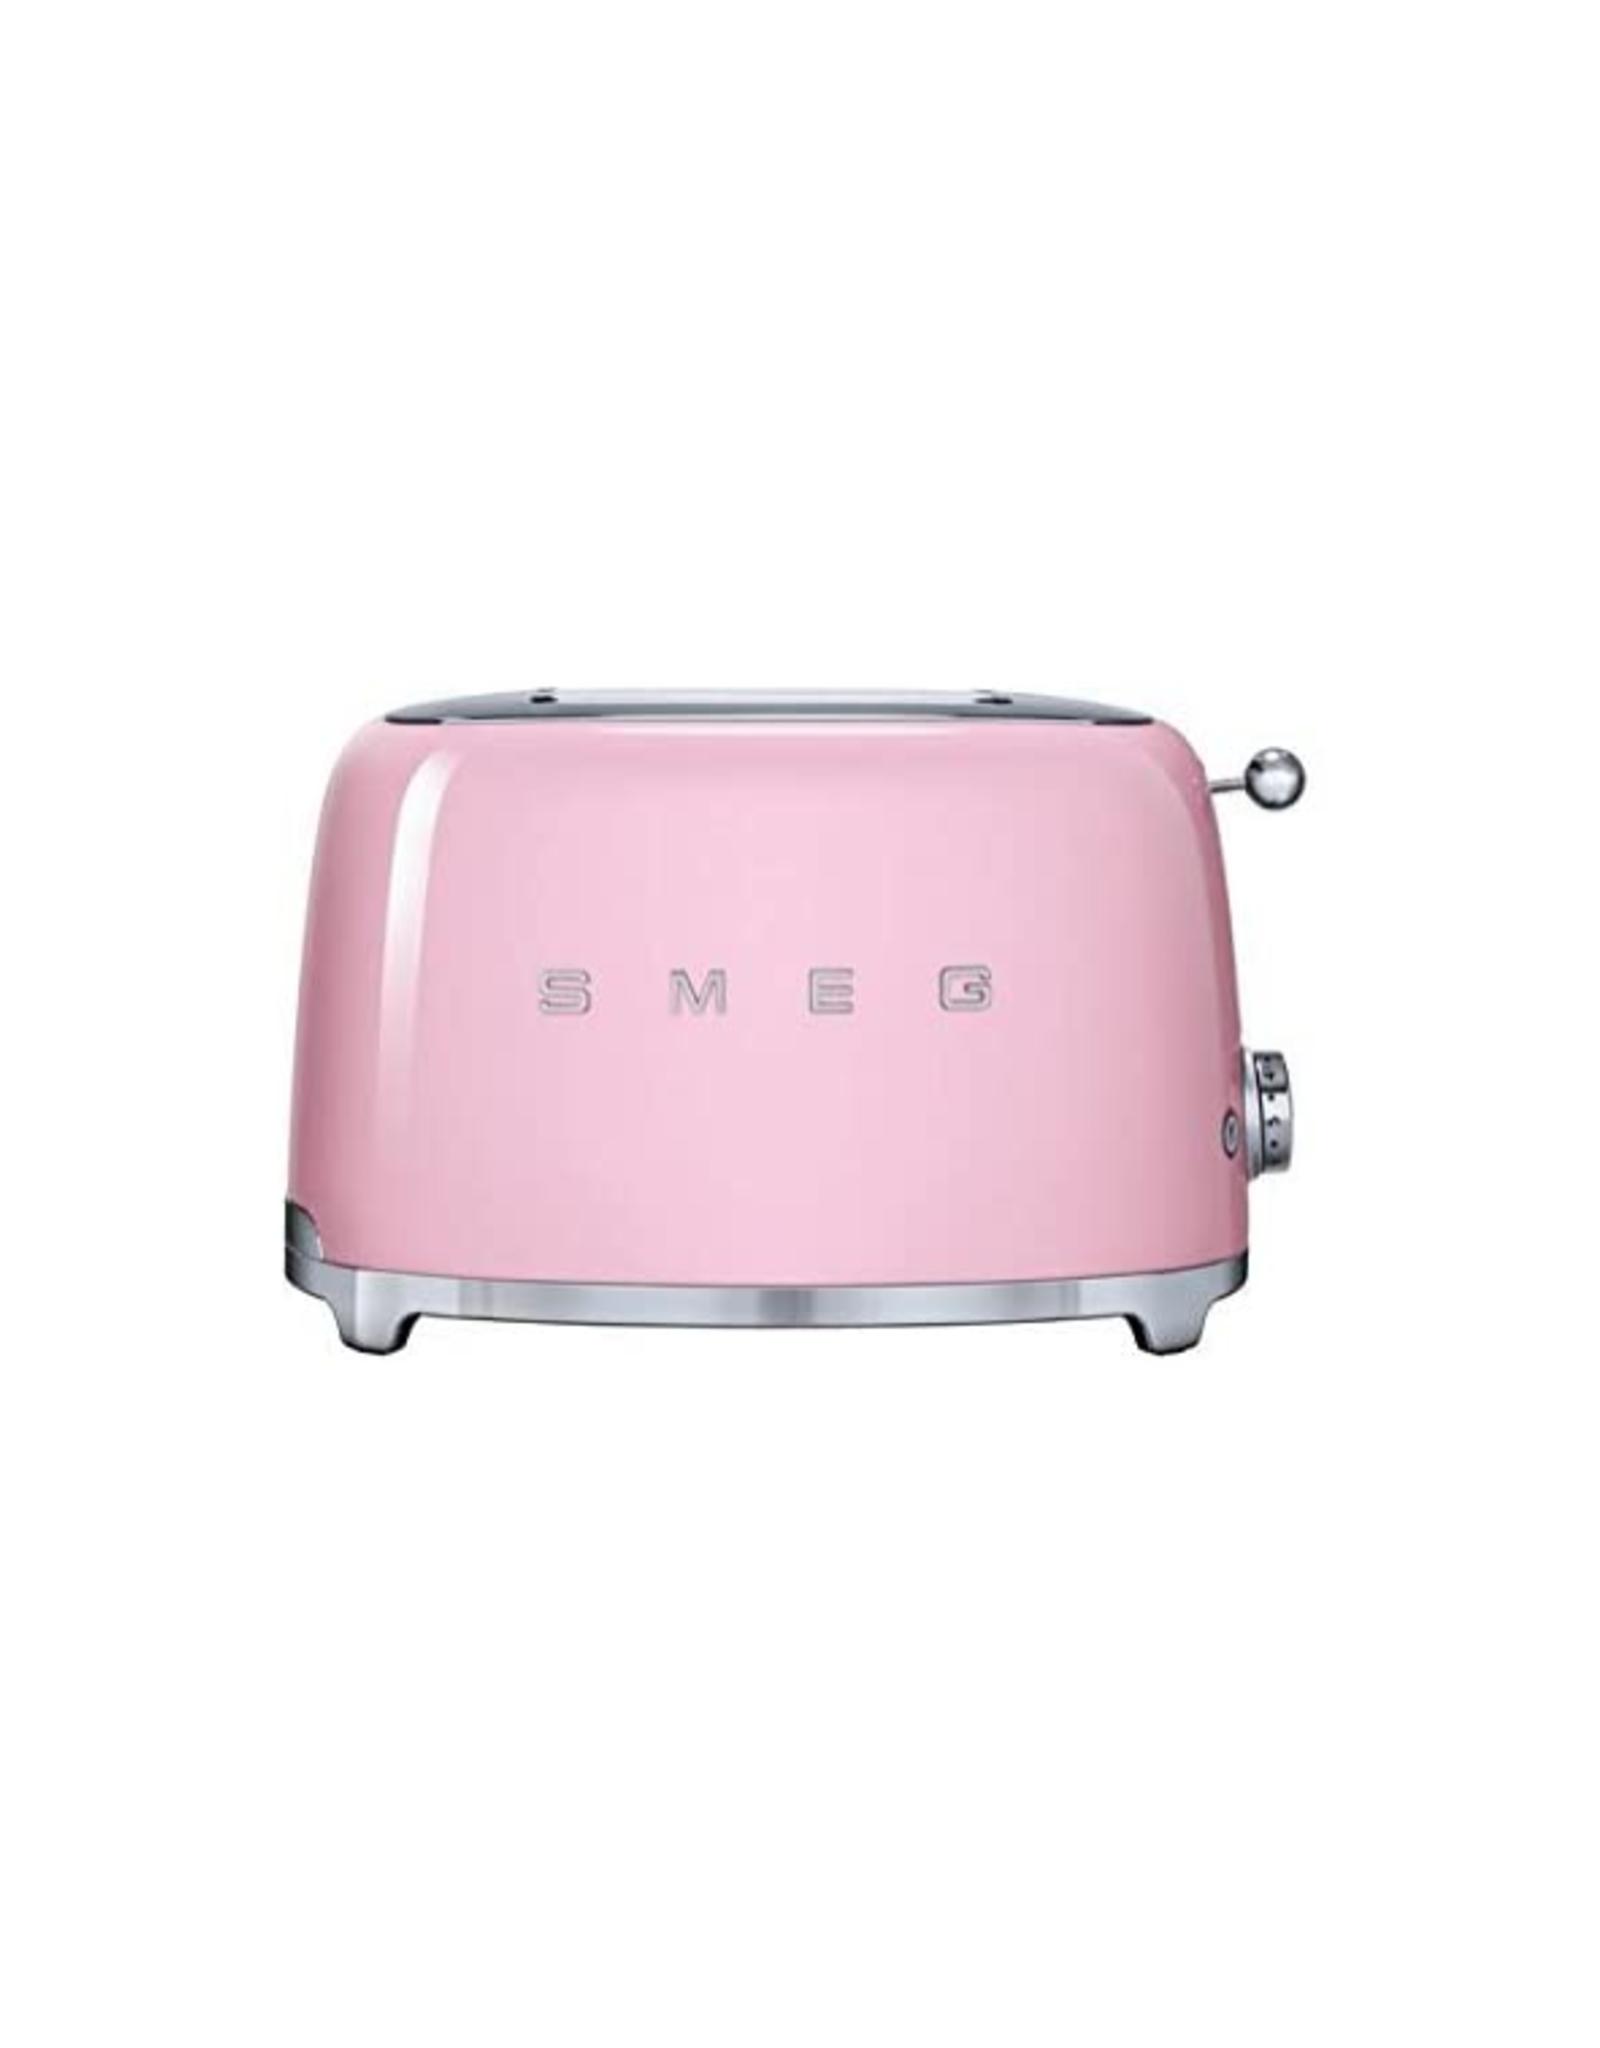 Smeg 2 Slice Toaster, Pink